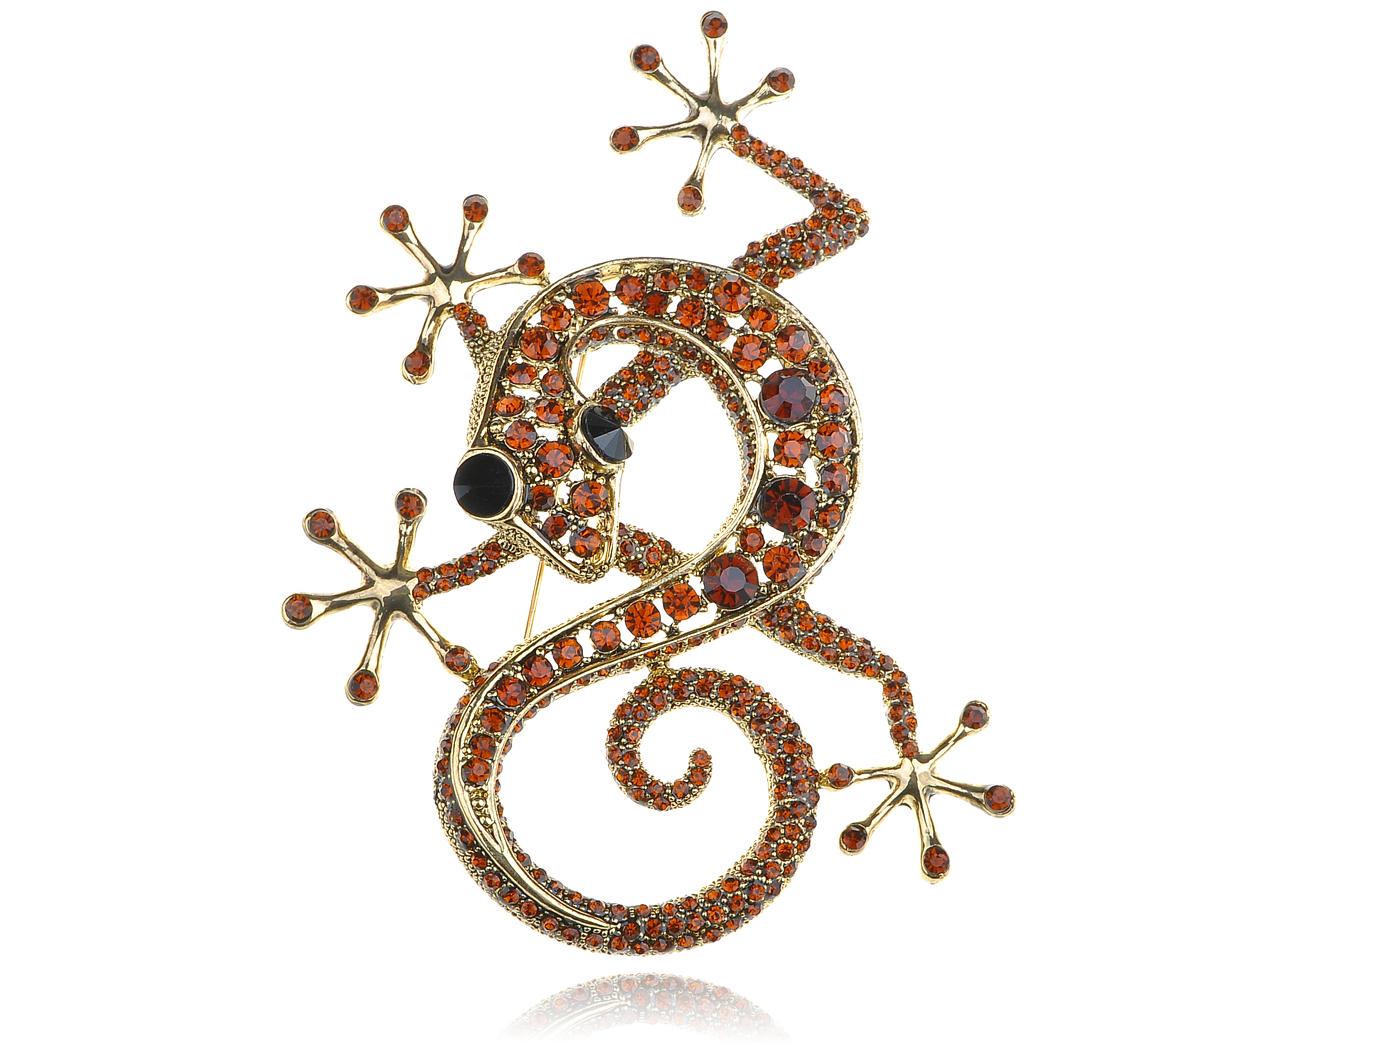 Red Ruby Crystal Rhinestone Gold Tone Gecko Lizard Reptile Animal Pin Brooch by